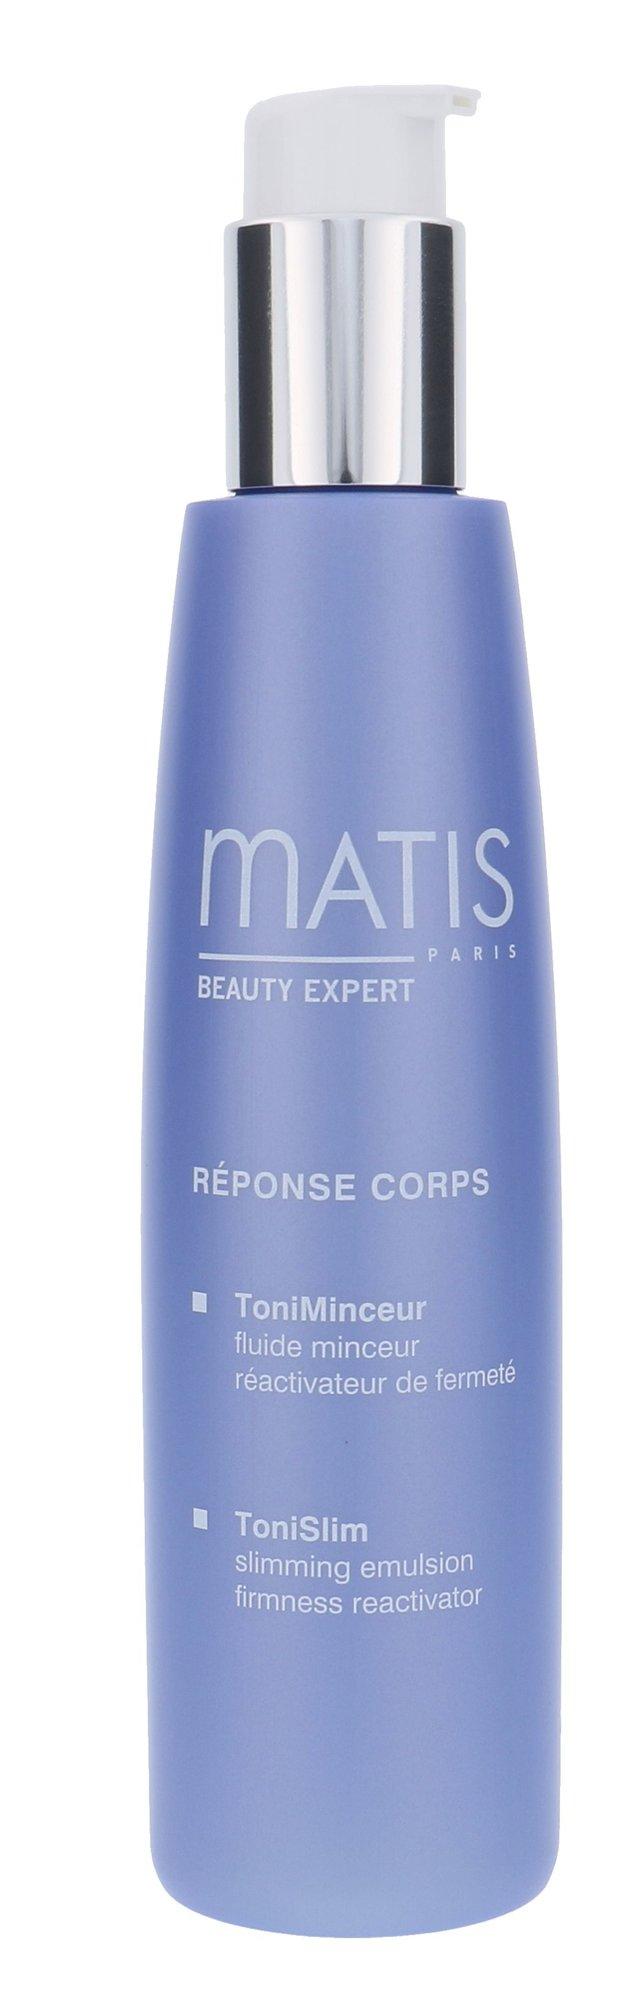 Matis Réponse Corps Cosmetic 200ml  ToniSlim